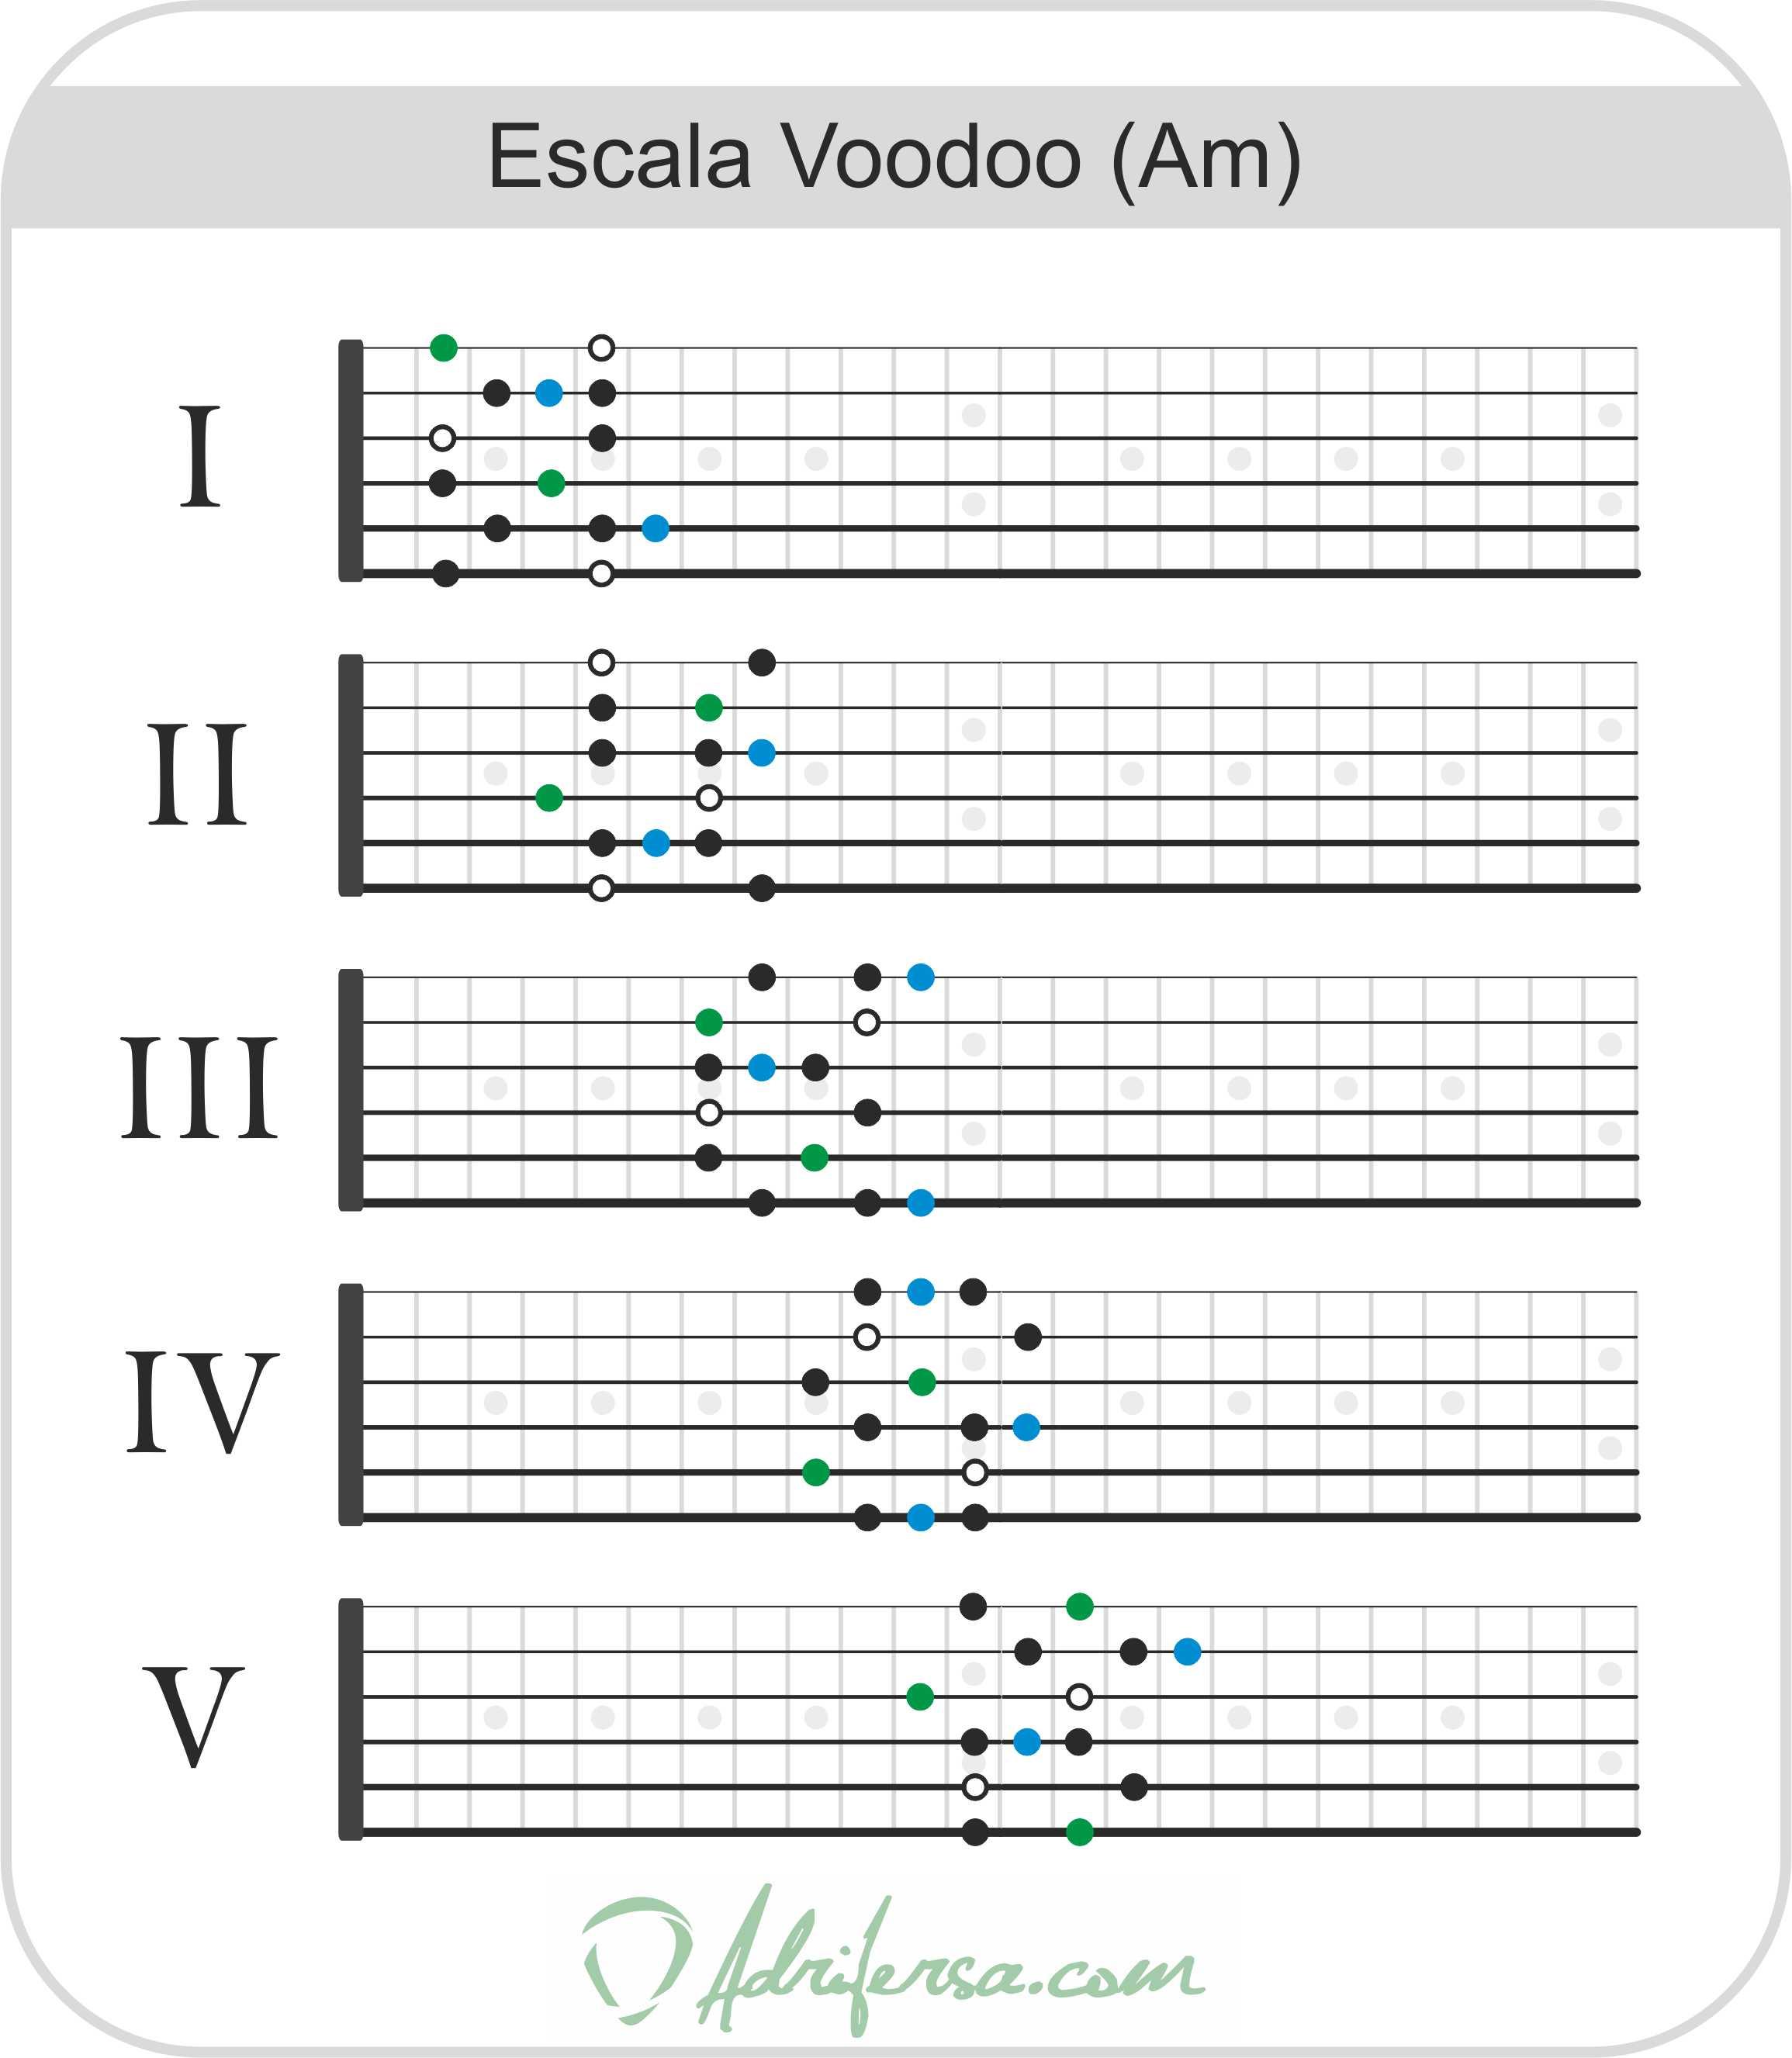 escala de blues voodoo